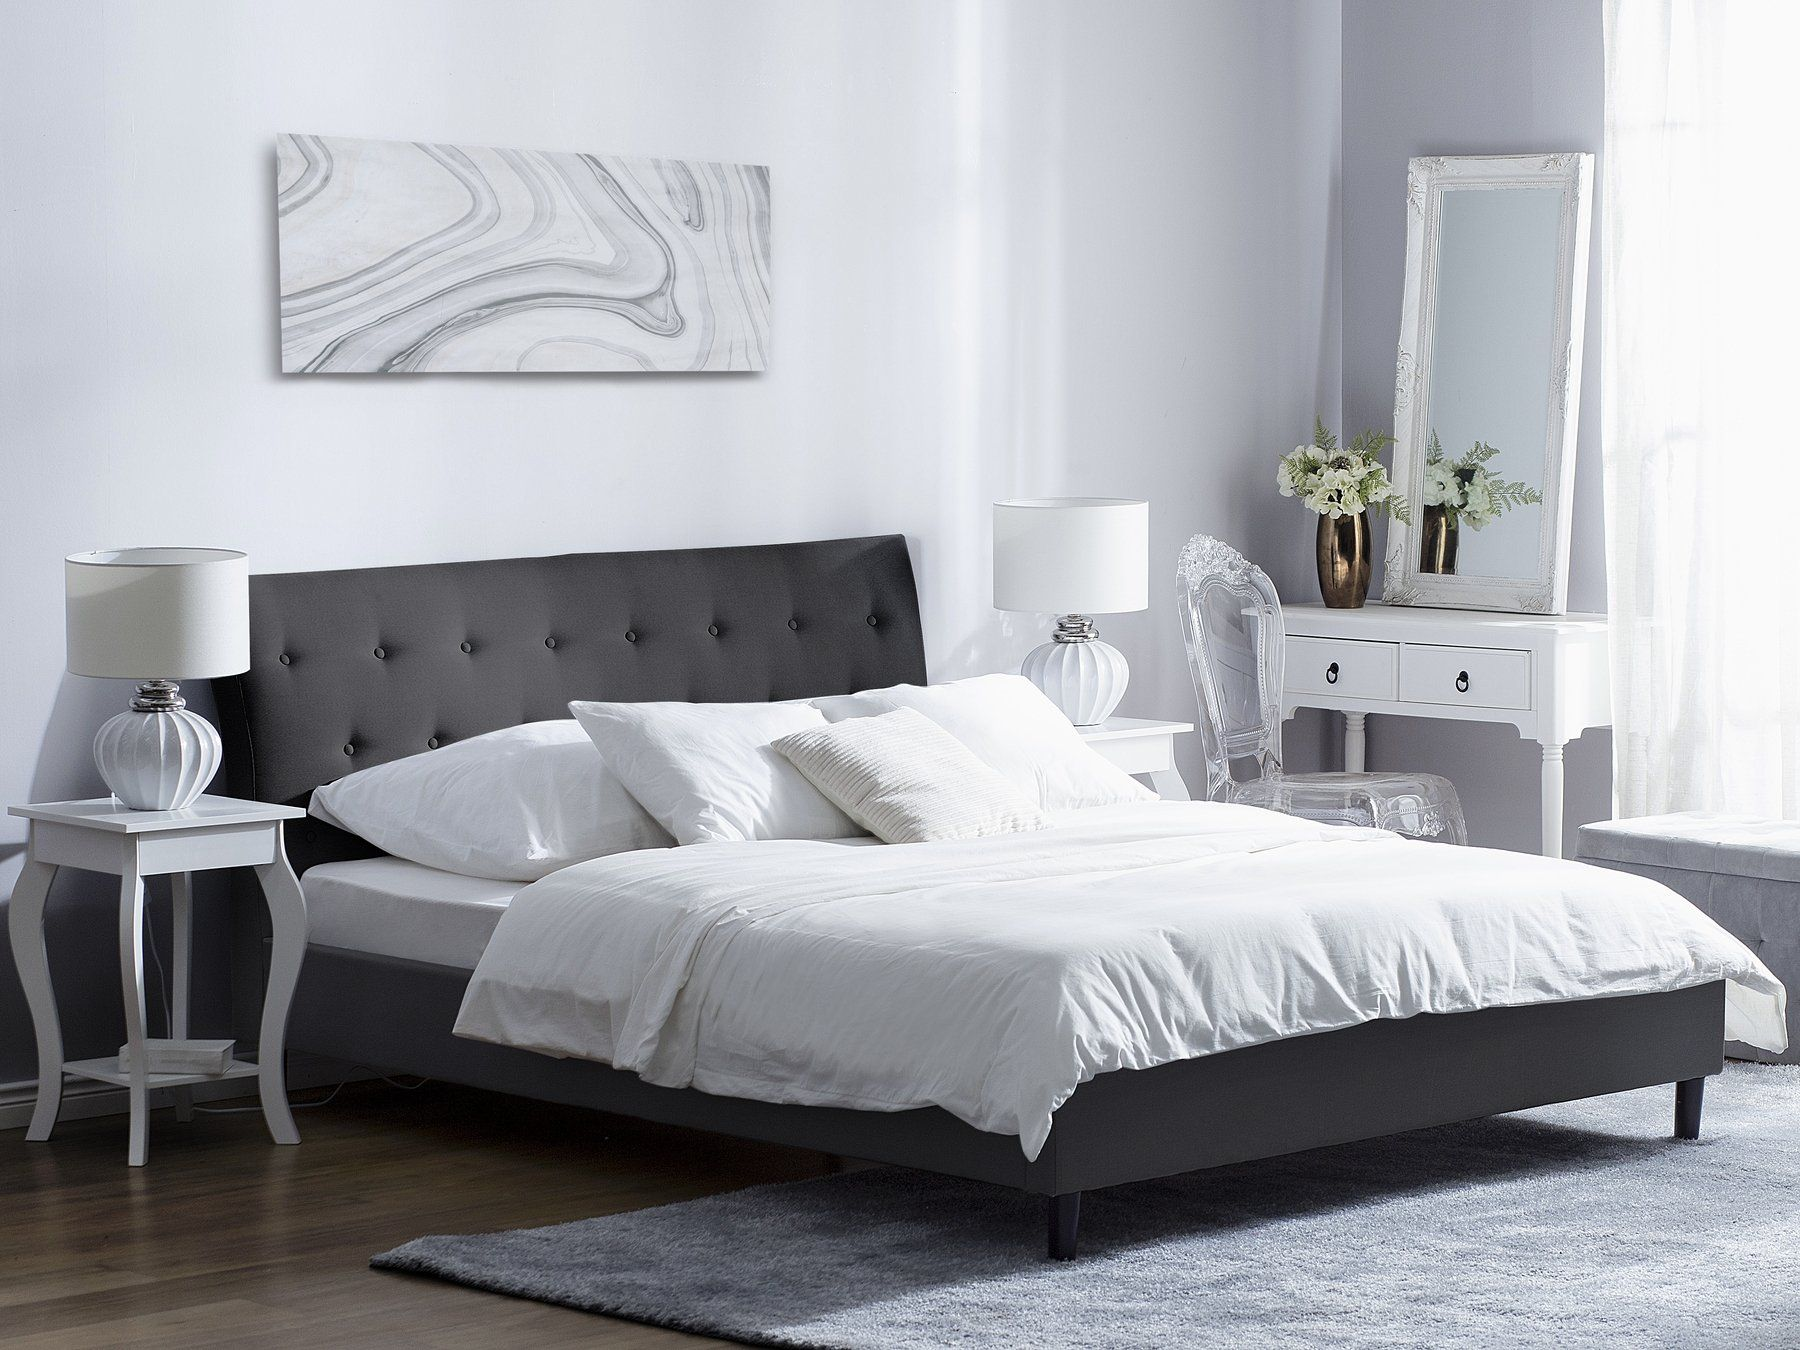 Fabric EU Super King Size Bed Dark Grey SAVERNE in 2020